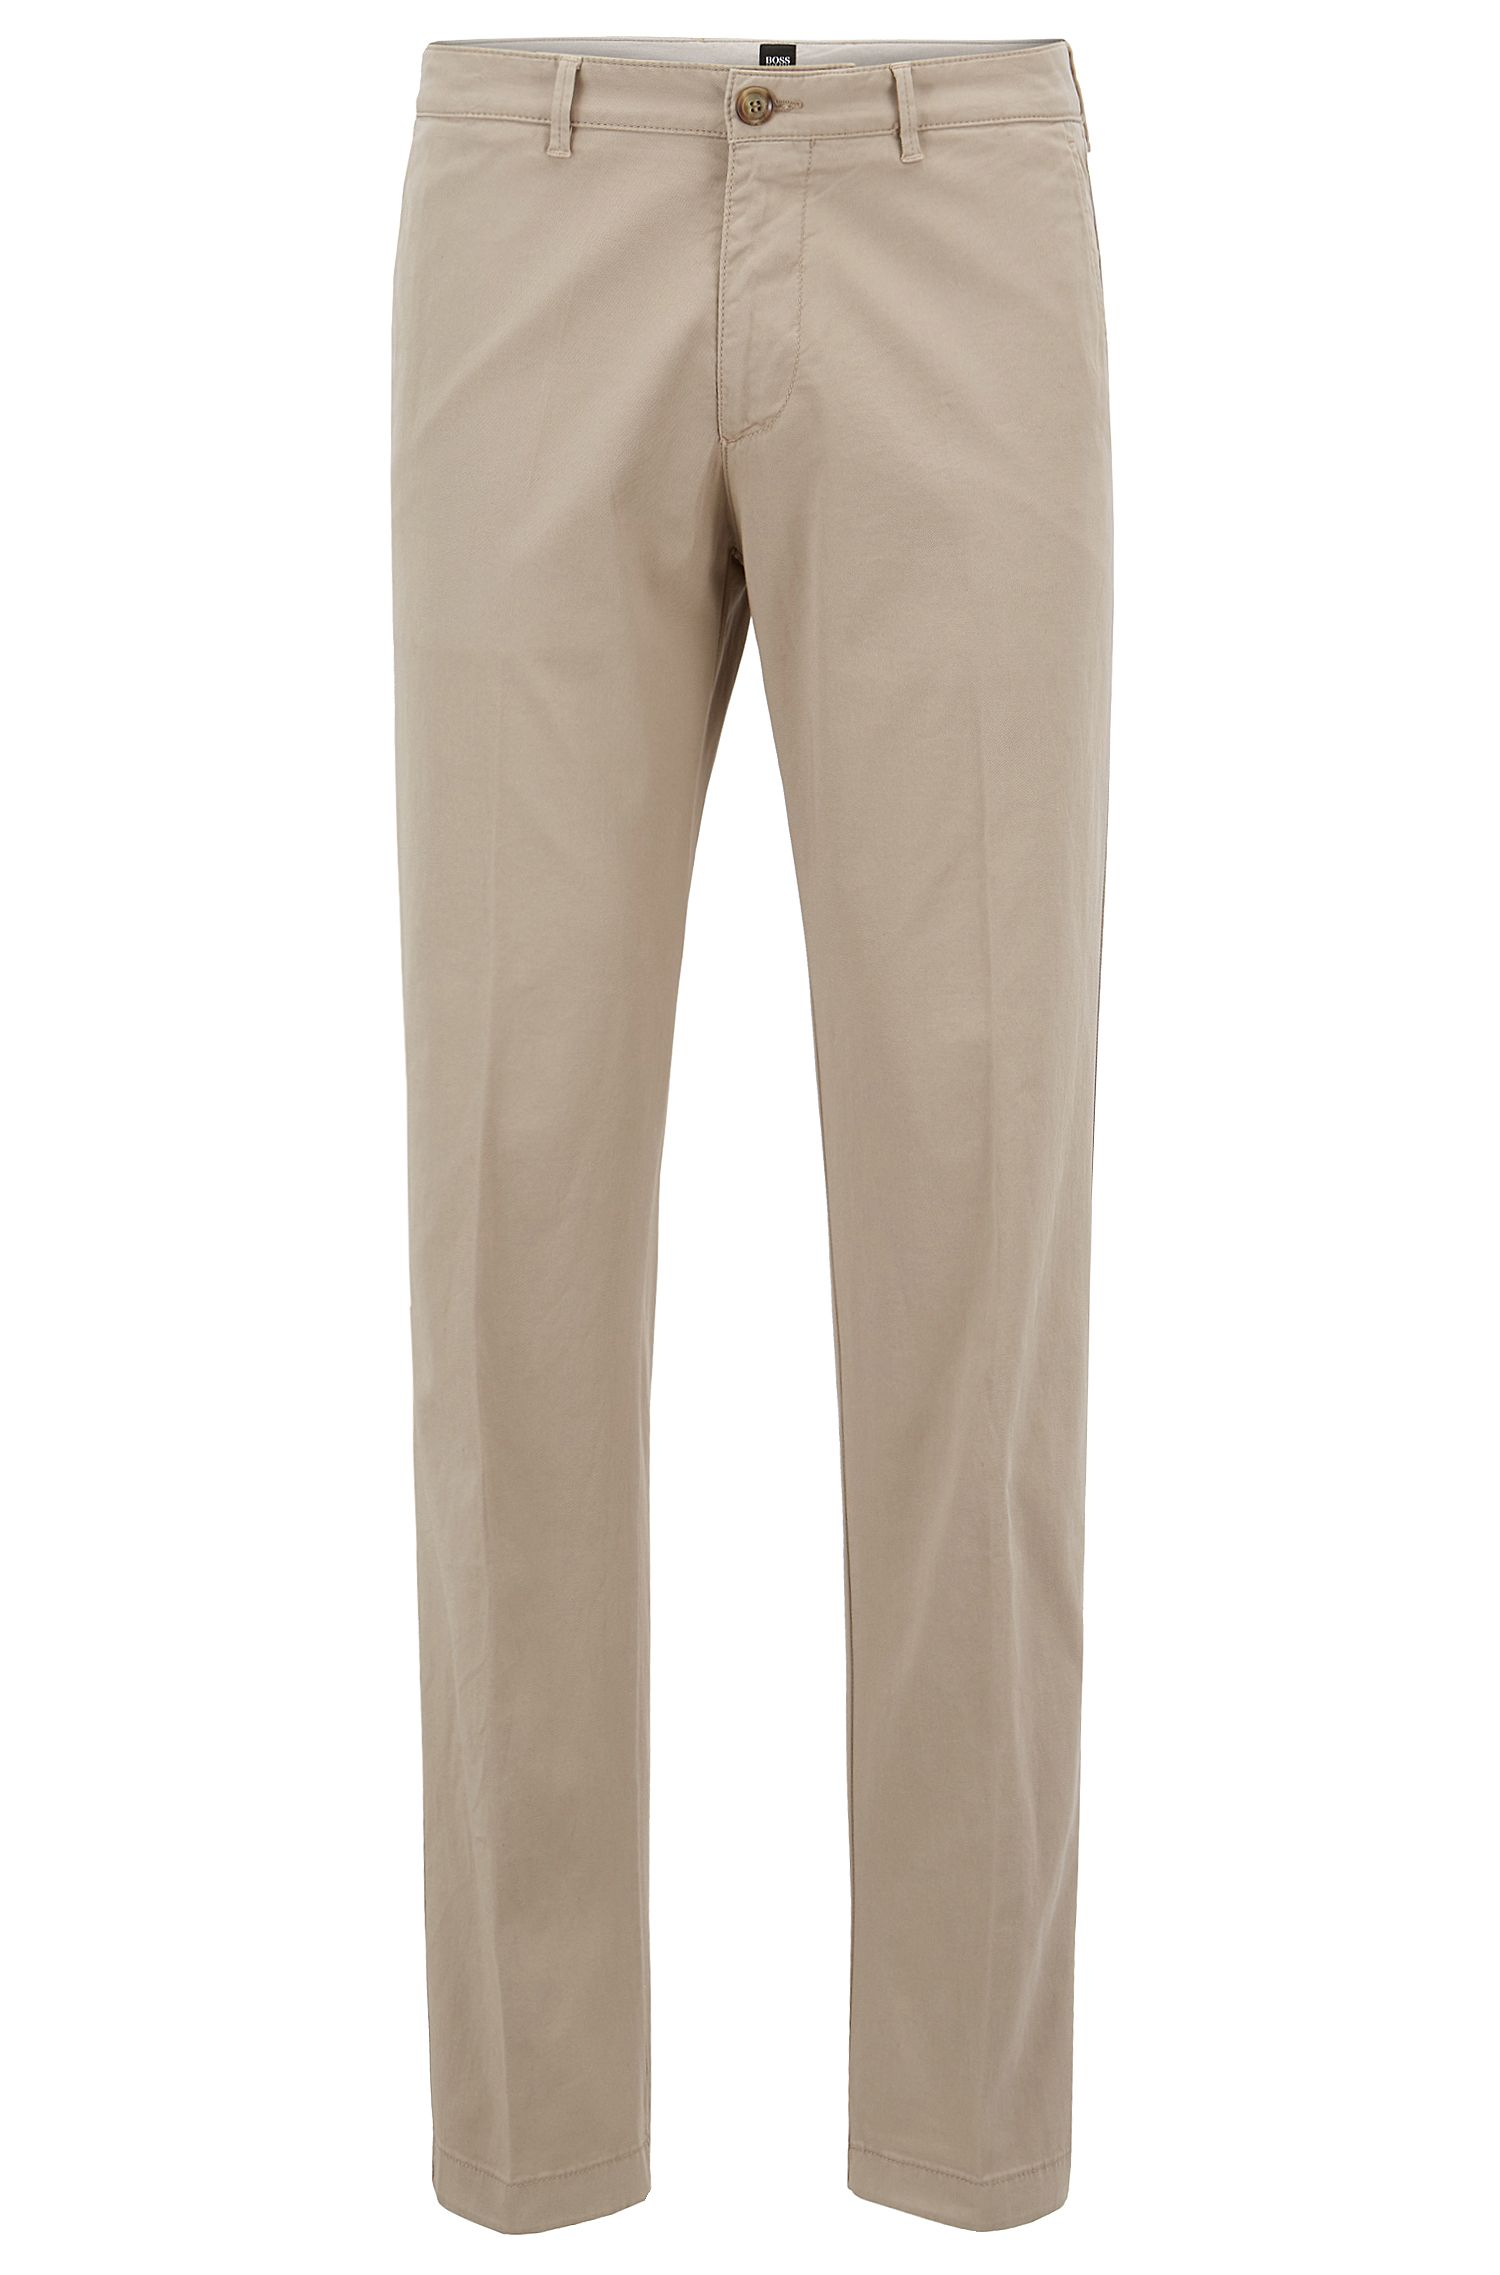 'Crigan D'   Regular Fit, Stretch Cotton Pants